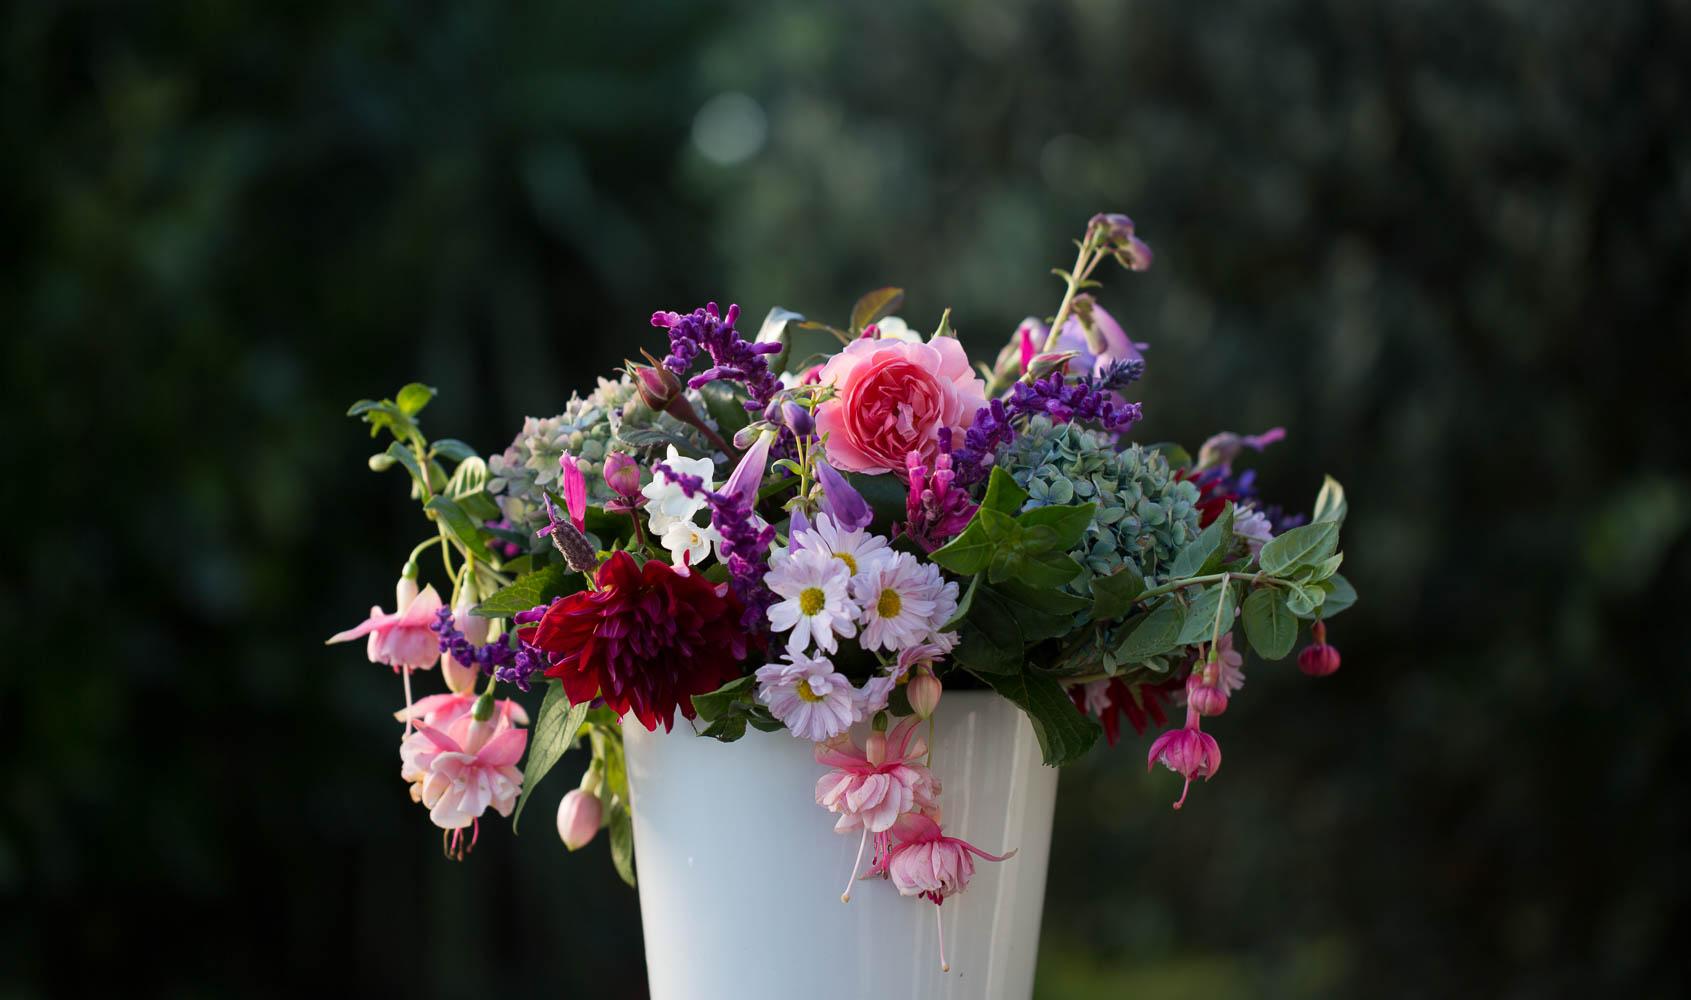 Cut Flowers Autumn Dahlia, Chrysanthemum, Roses, Hydrangeas and Fuschia